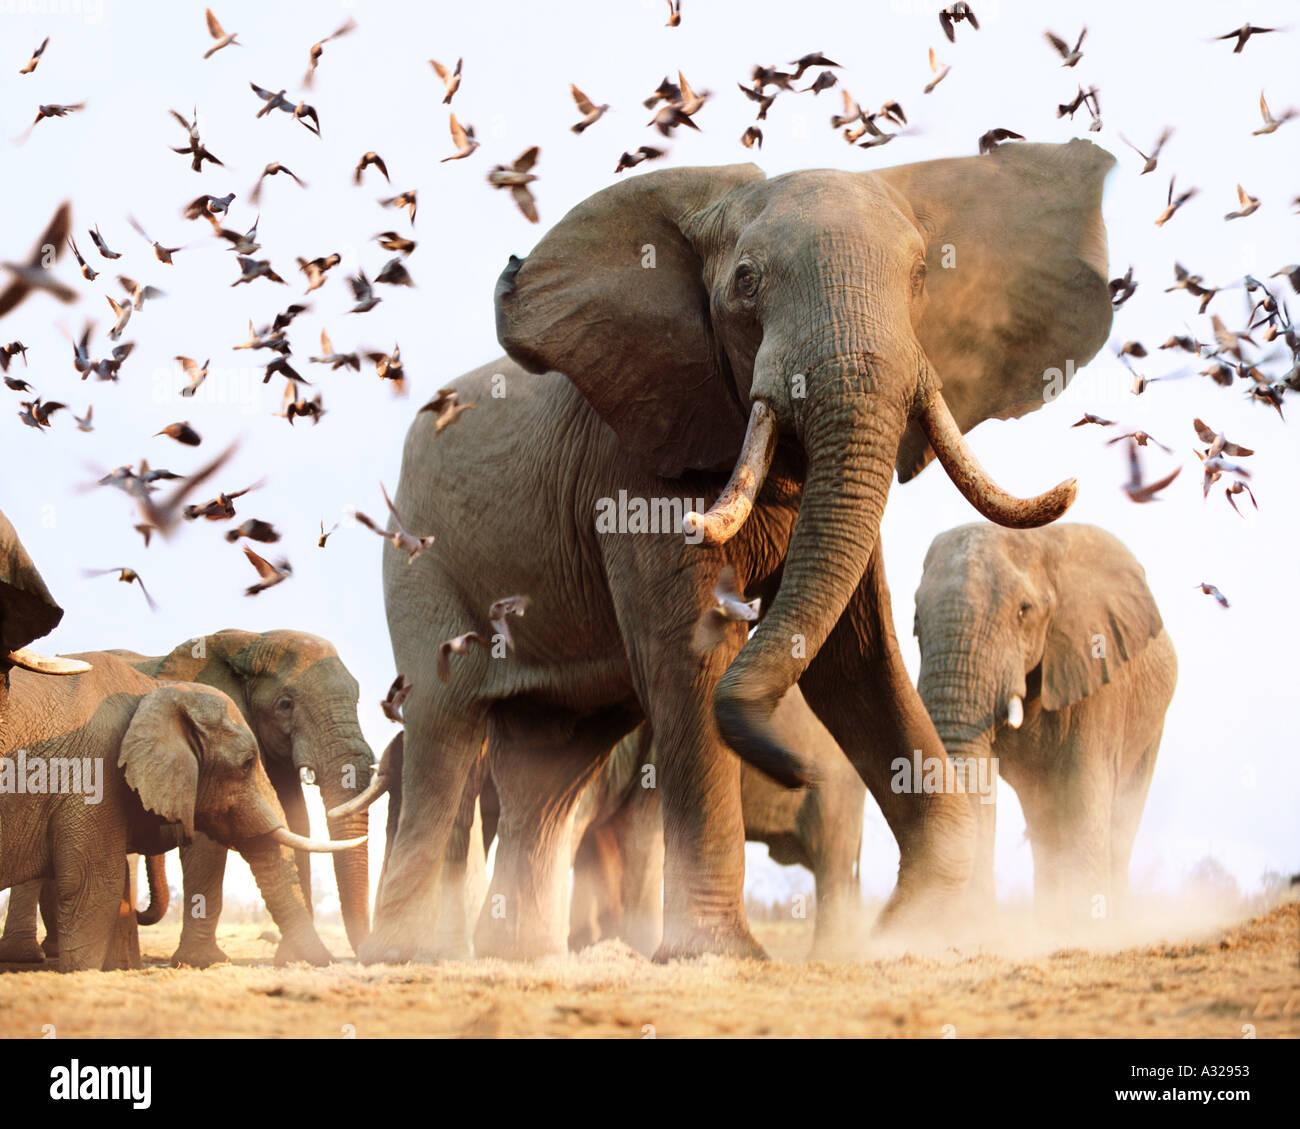 Gli elefanti africani inquietante stormo di uccelli Savuti Botswana Foto Stock